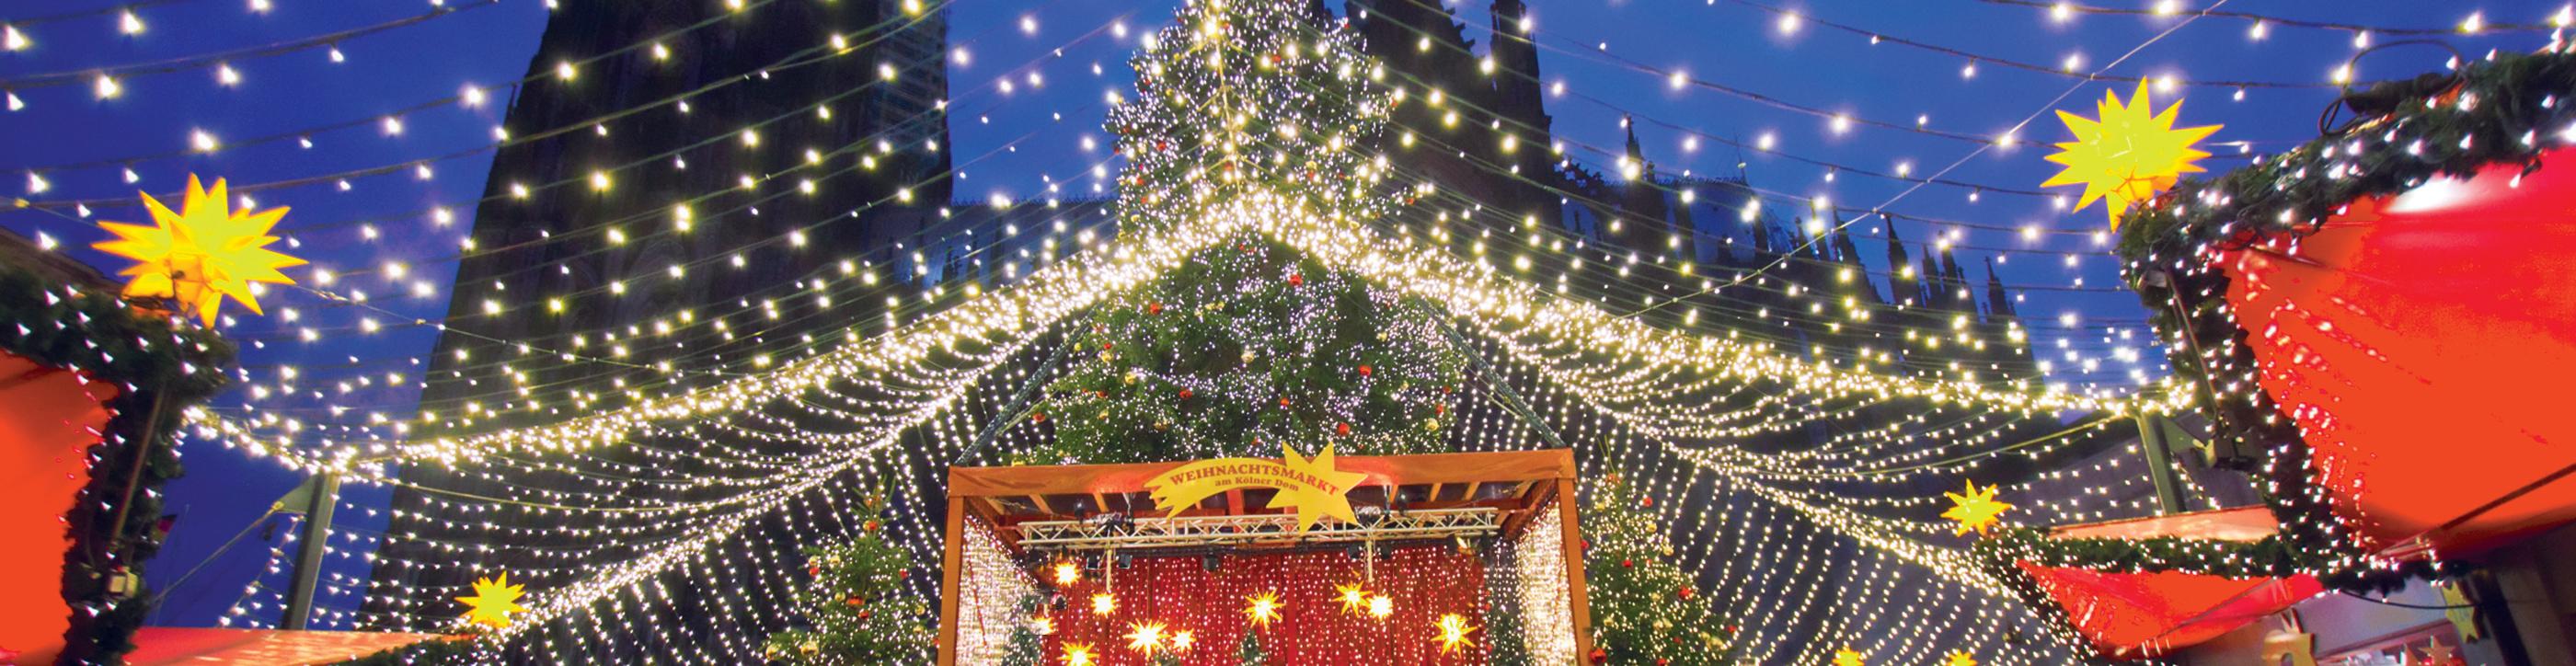 Rhine Holiday Markets 2020 Europe River Cruise